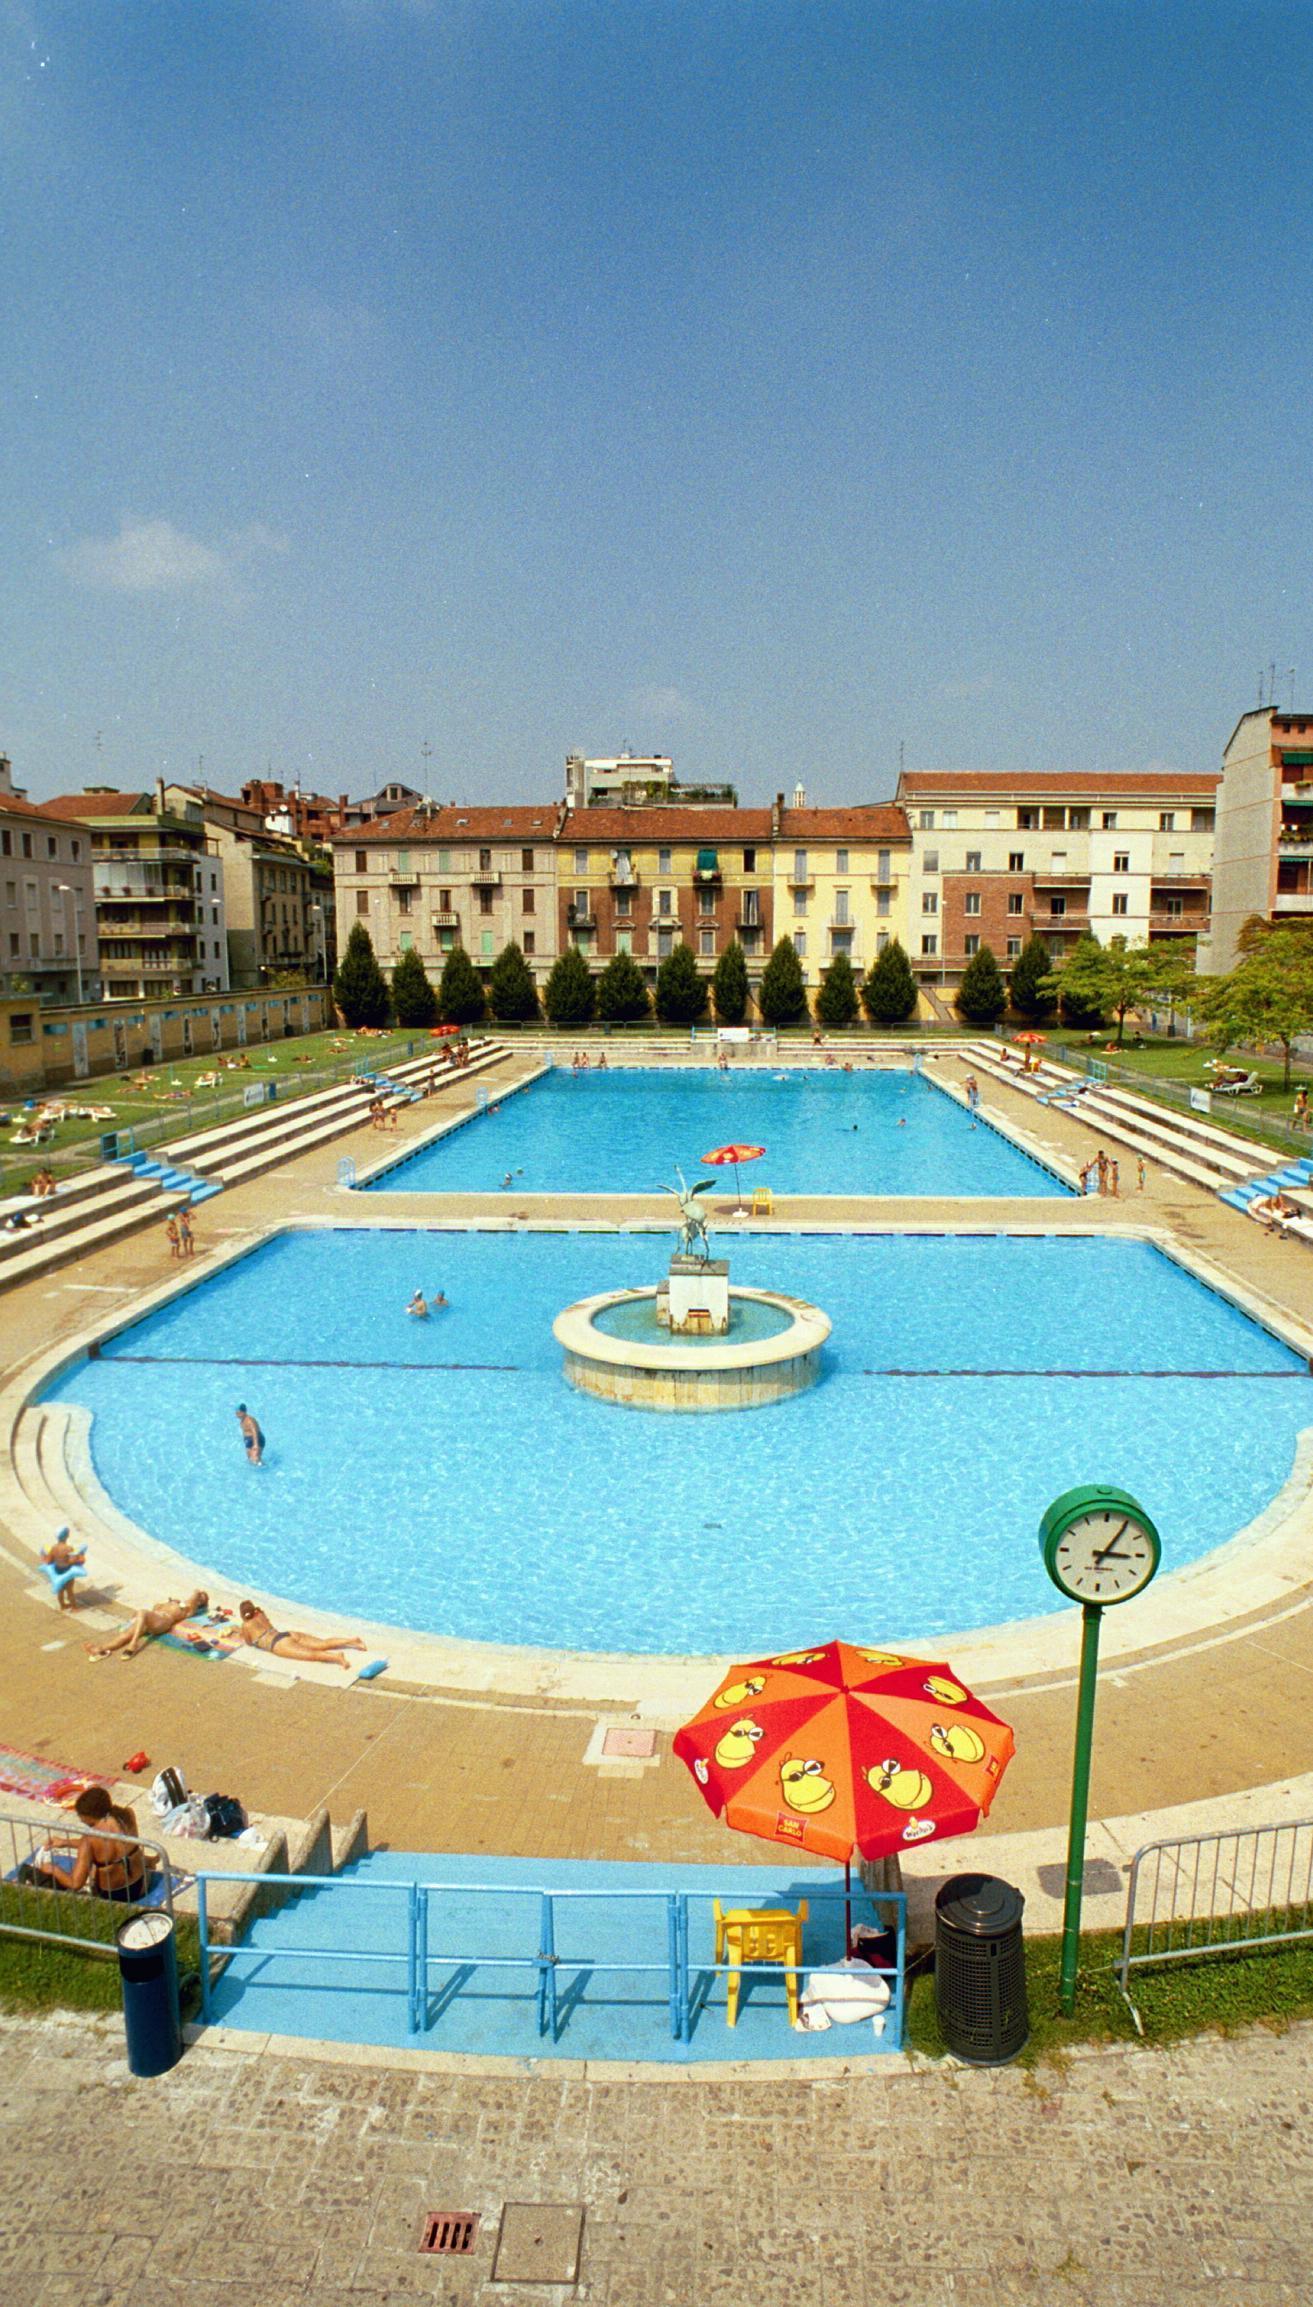 La piscina teatro ruba un impianto al nuoto - Piscina al coperto milano ...